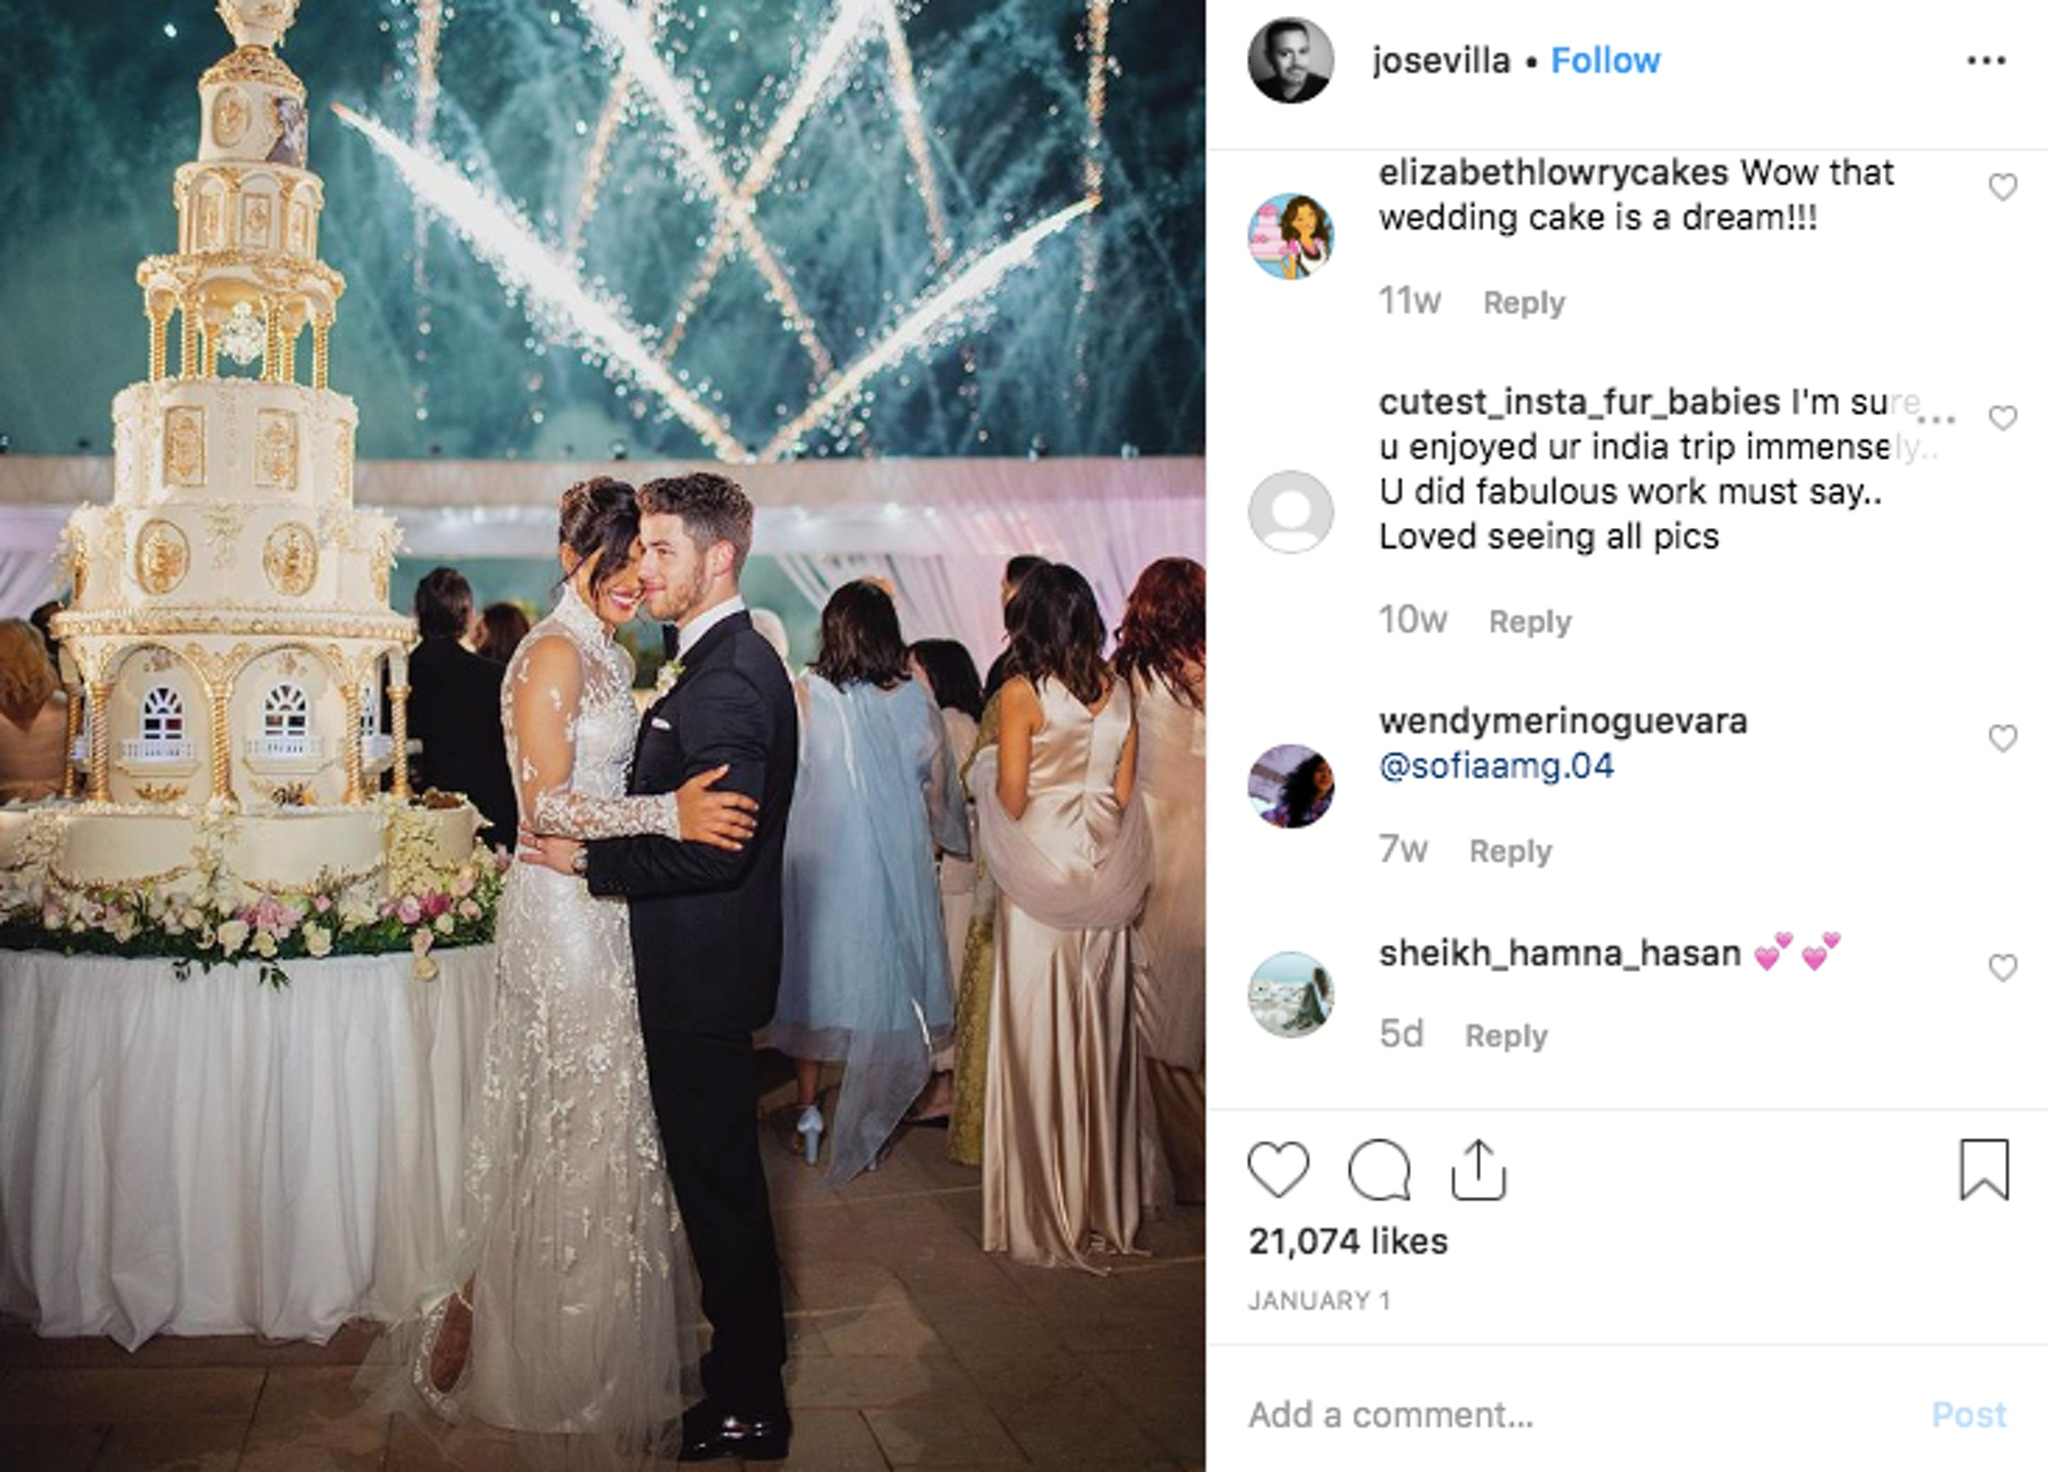 Nick Jonas and Priyanka Chopra wedding with extravagant gold and white cake